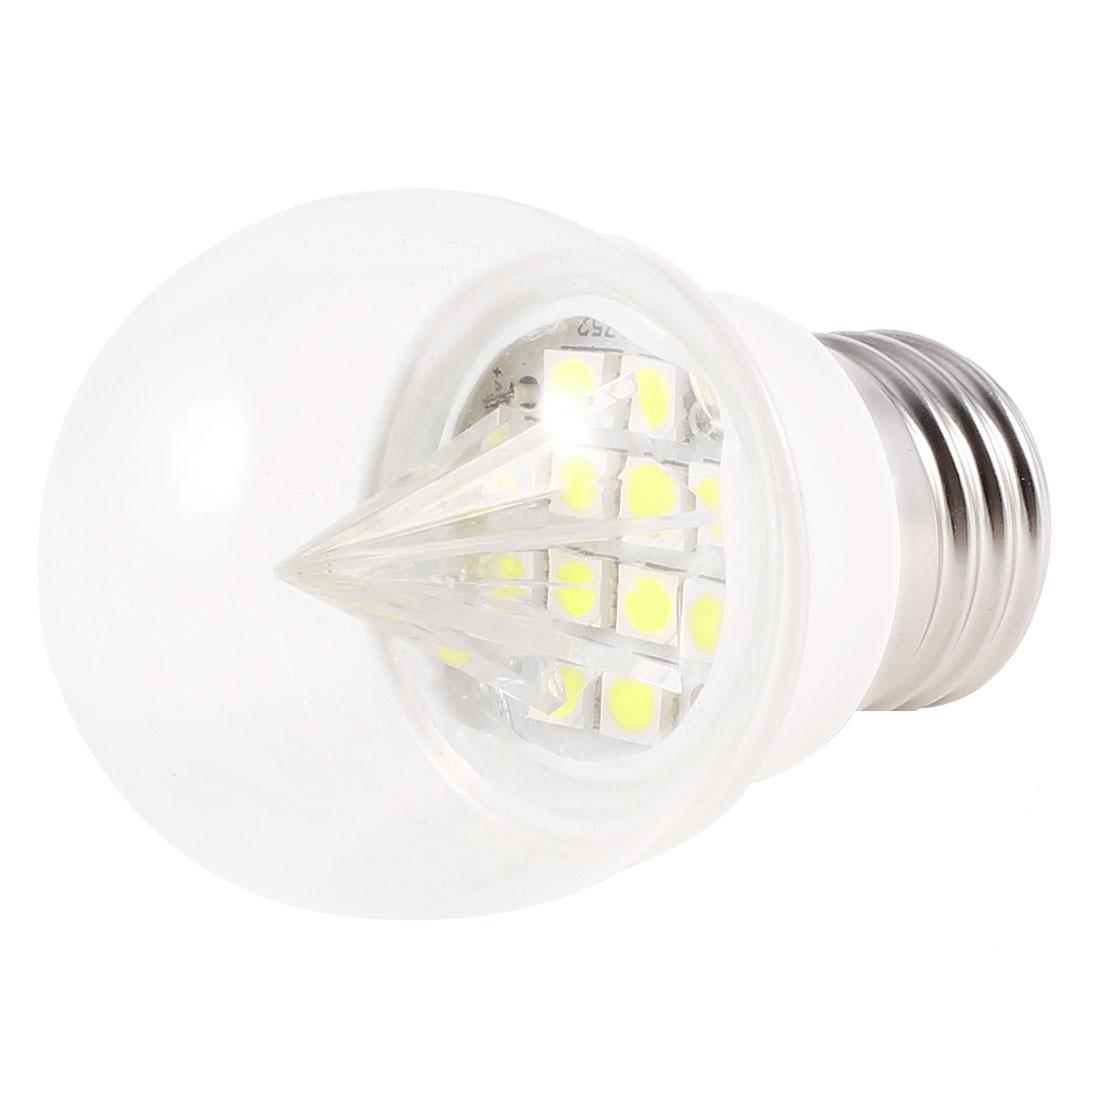 E27 Screw Base Energy Saving White 12 LEDs Ball Bulb Lamp AC 220V 2W 6500K